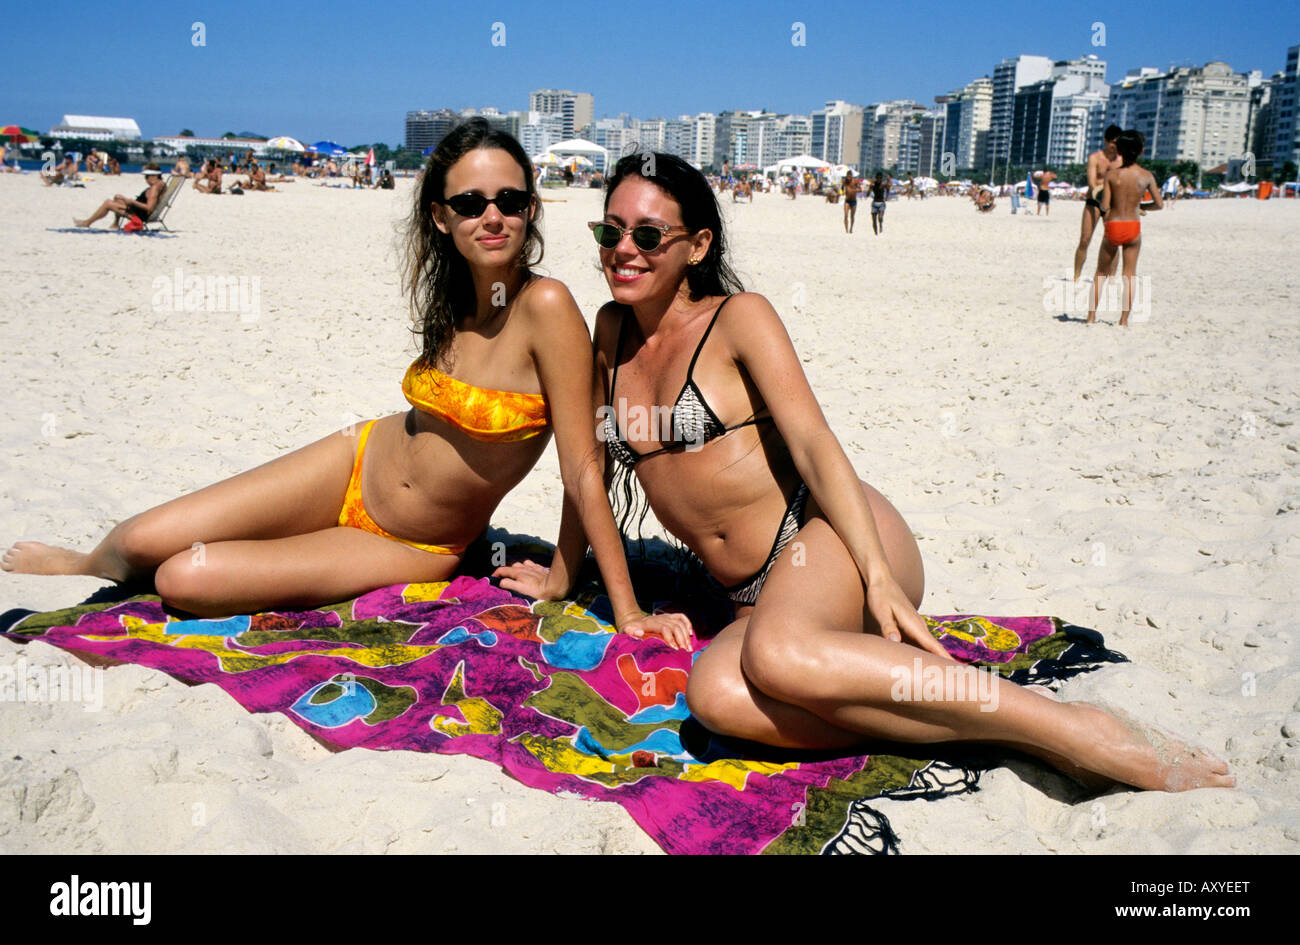 Girls at Copacabana beach   Copacabana beach, Rio de